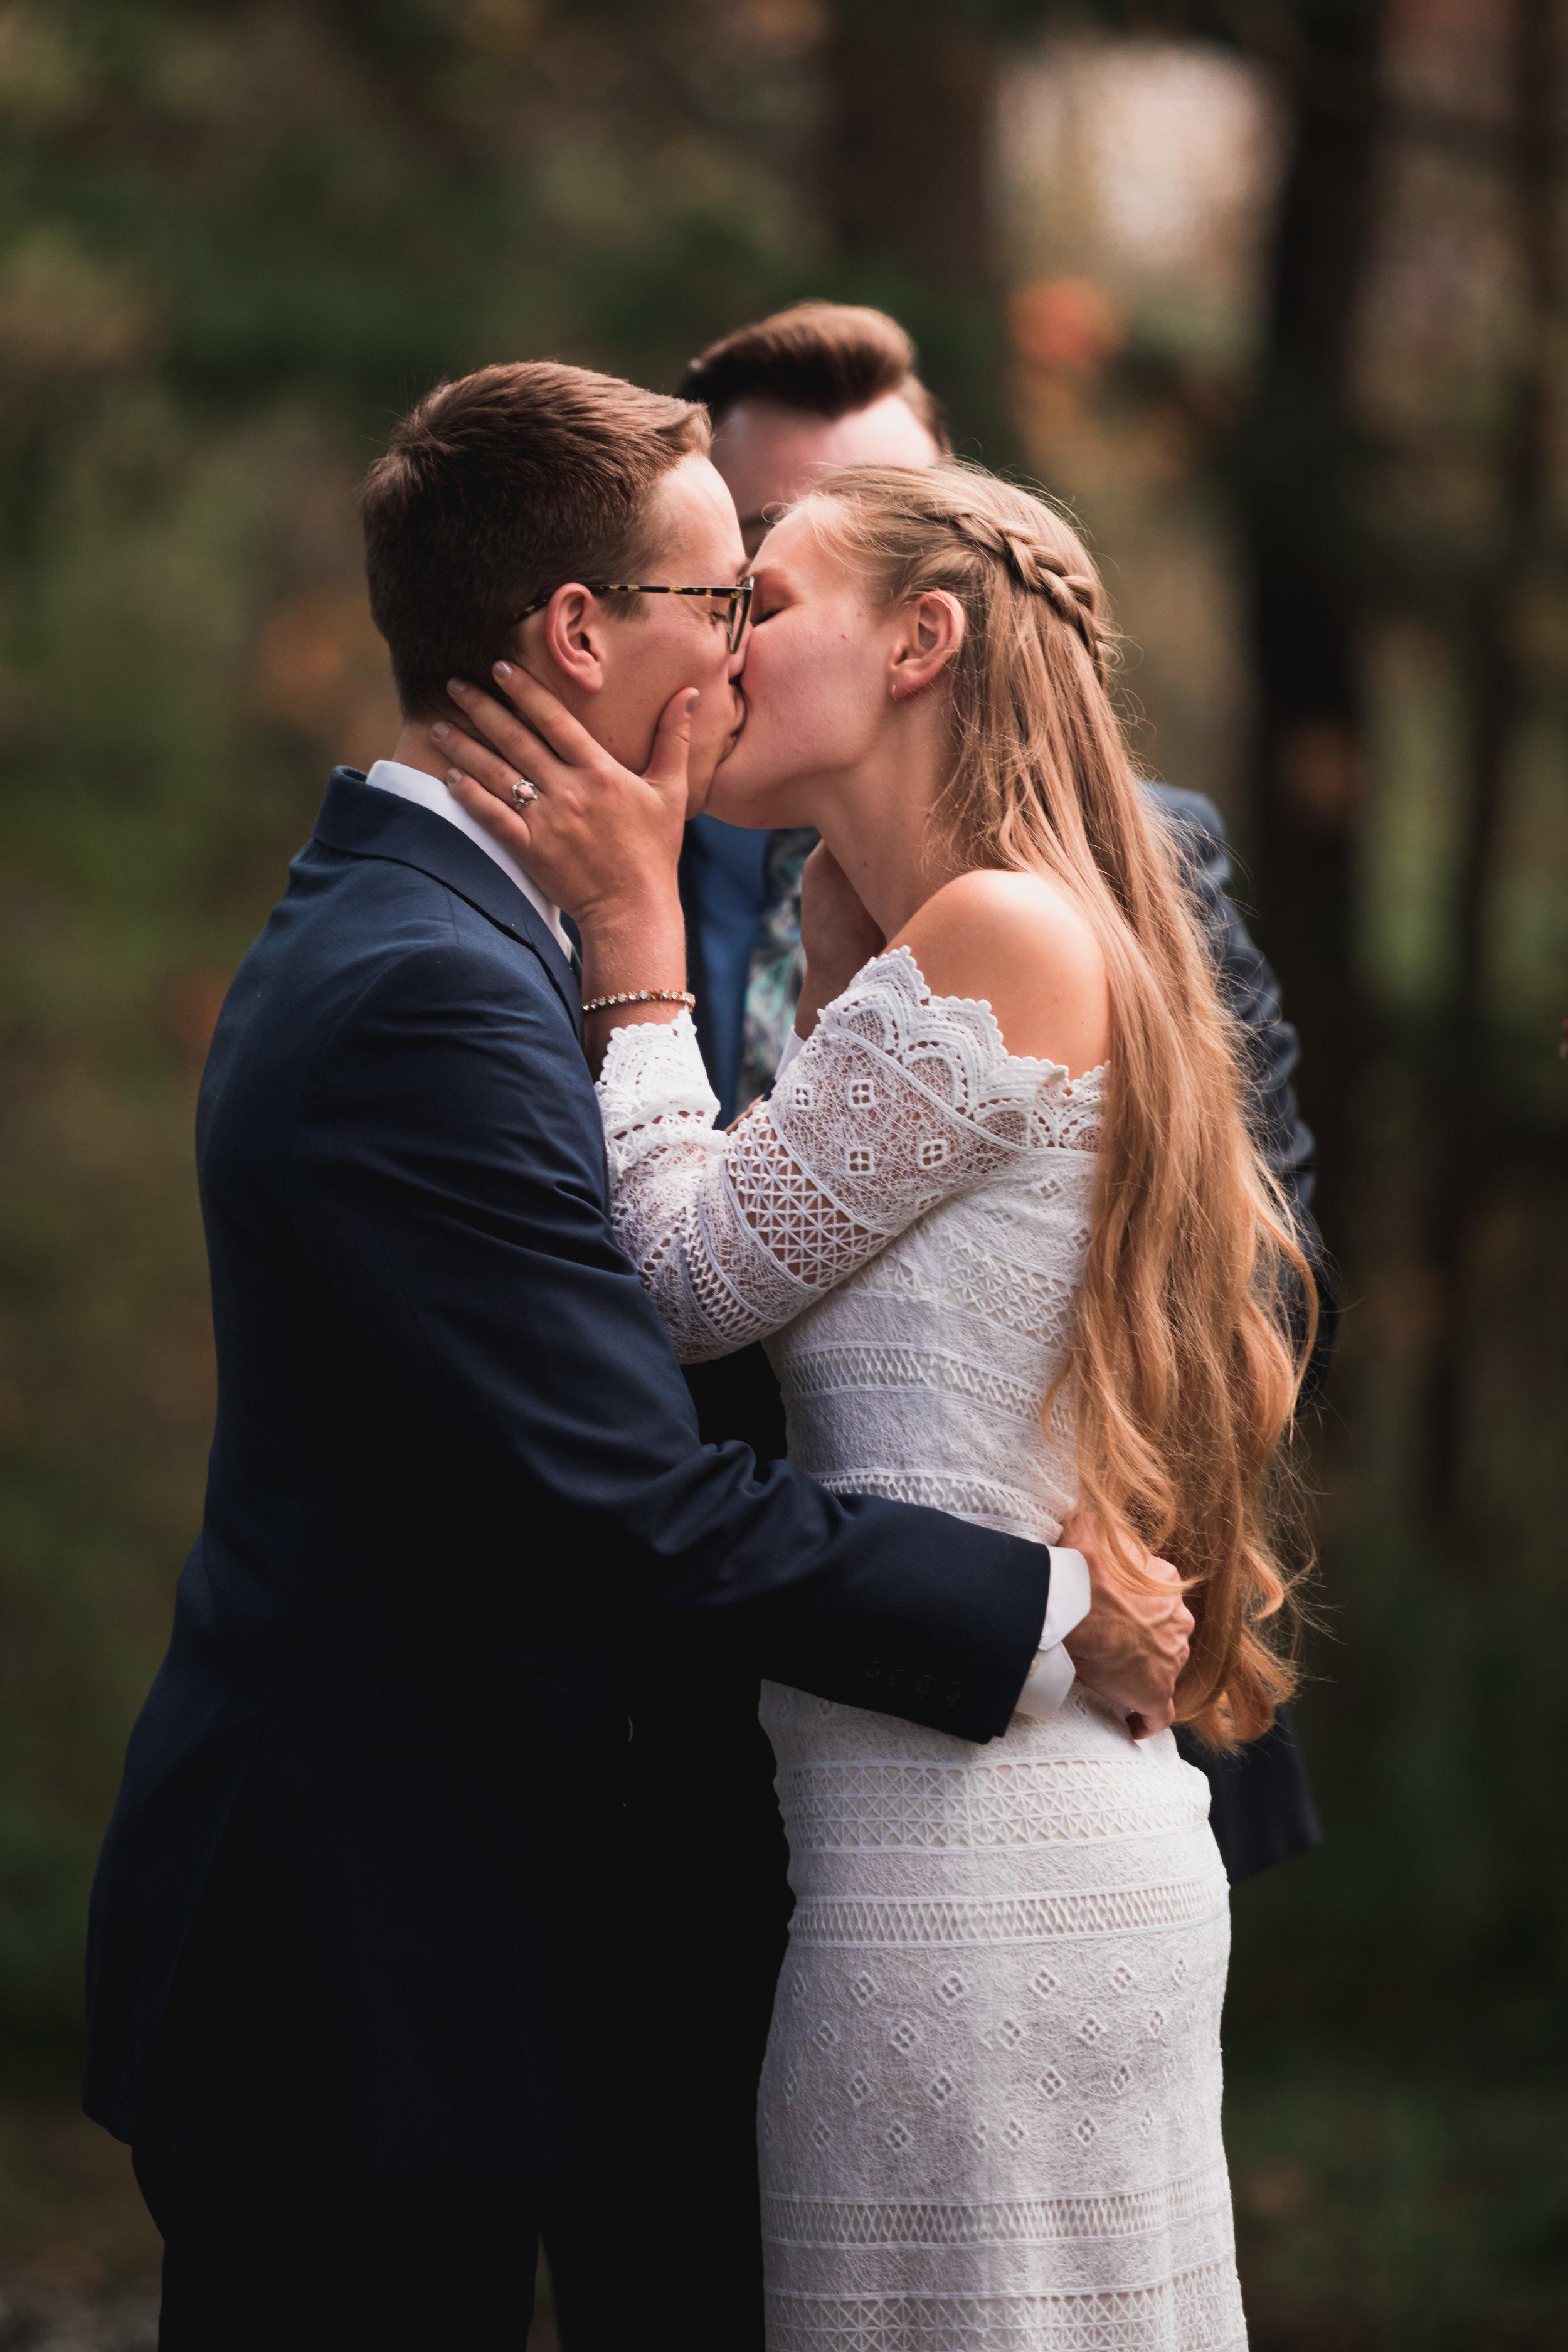 vild-photography-photographer-tahoe-intimate-wedding-adventure-van-abigail-48.jpg